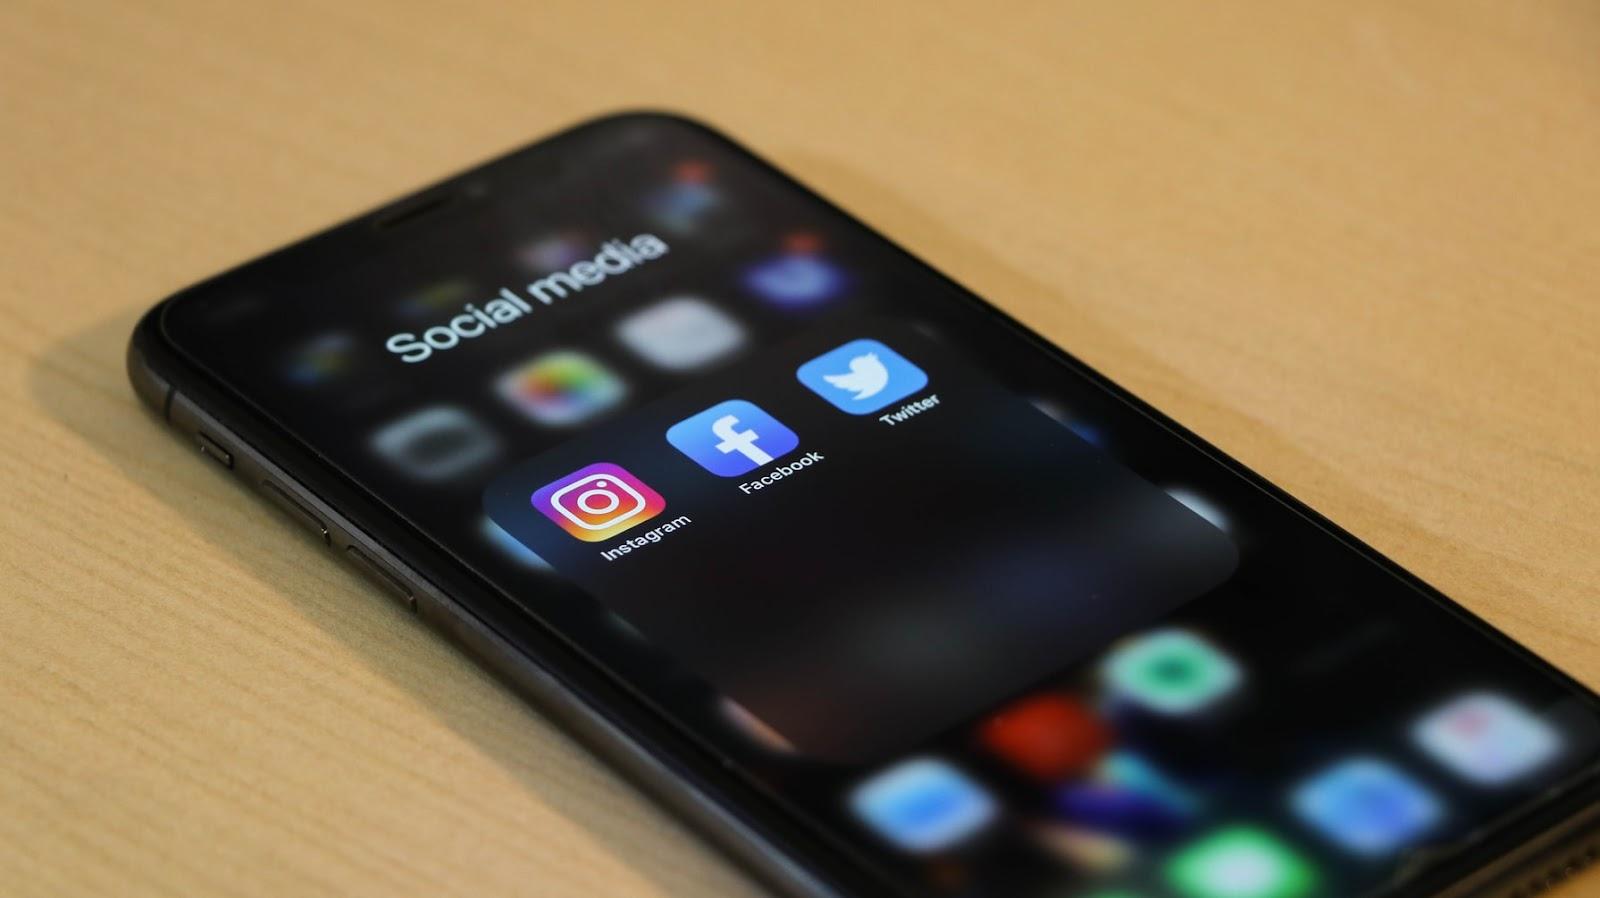 Order packaging and loyalty - Smart phone social media